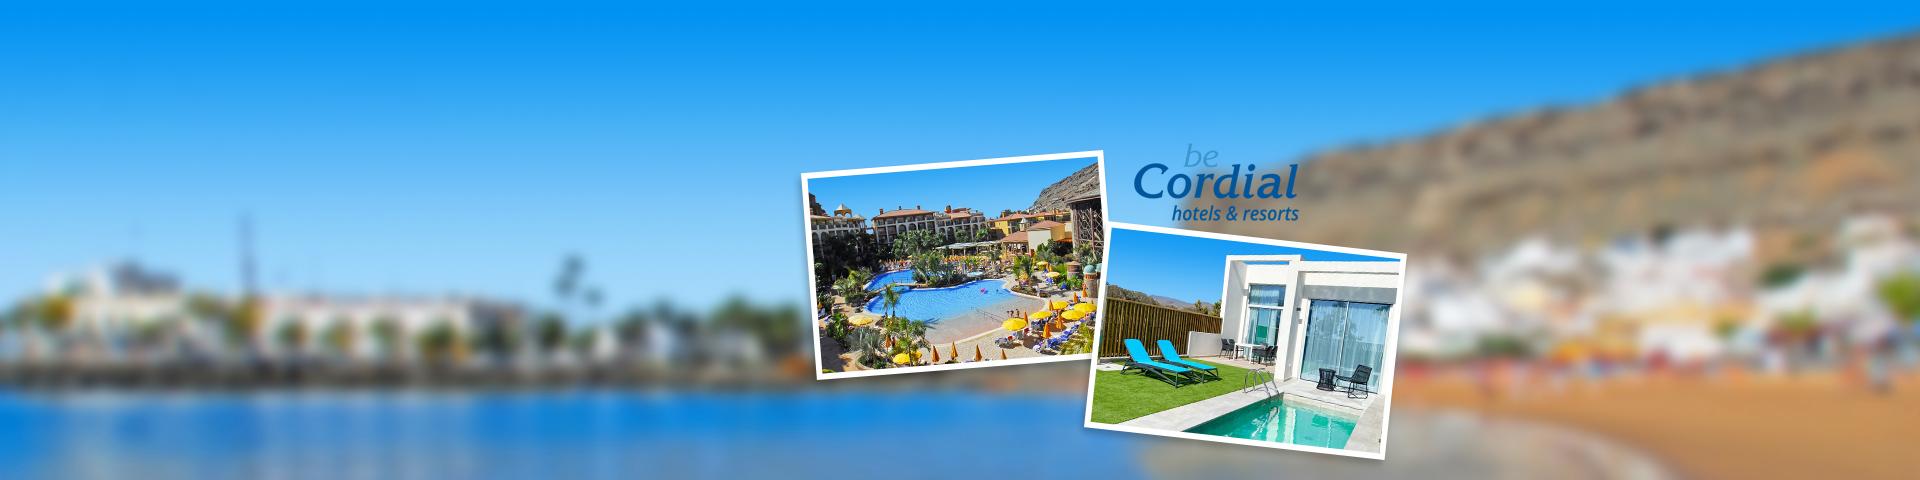 Cordial Hotels & Resorts